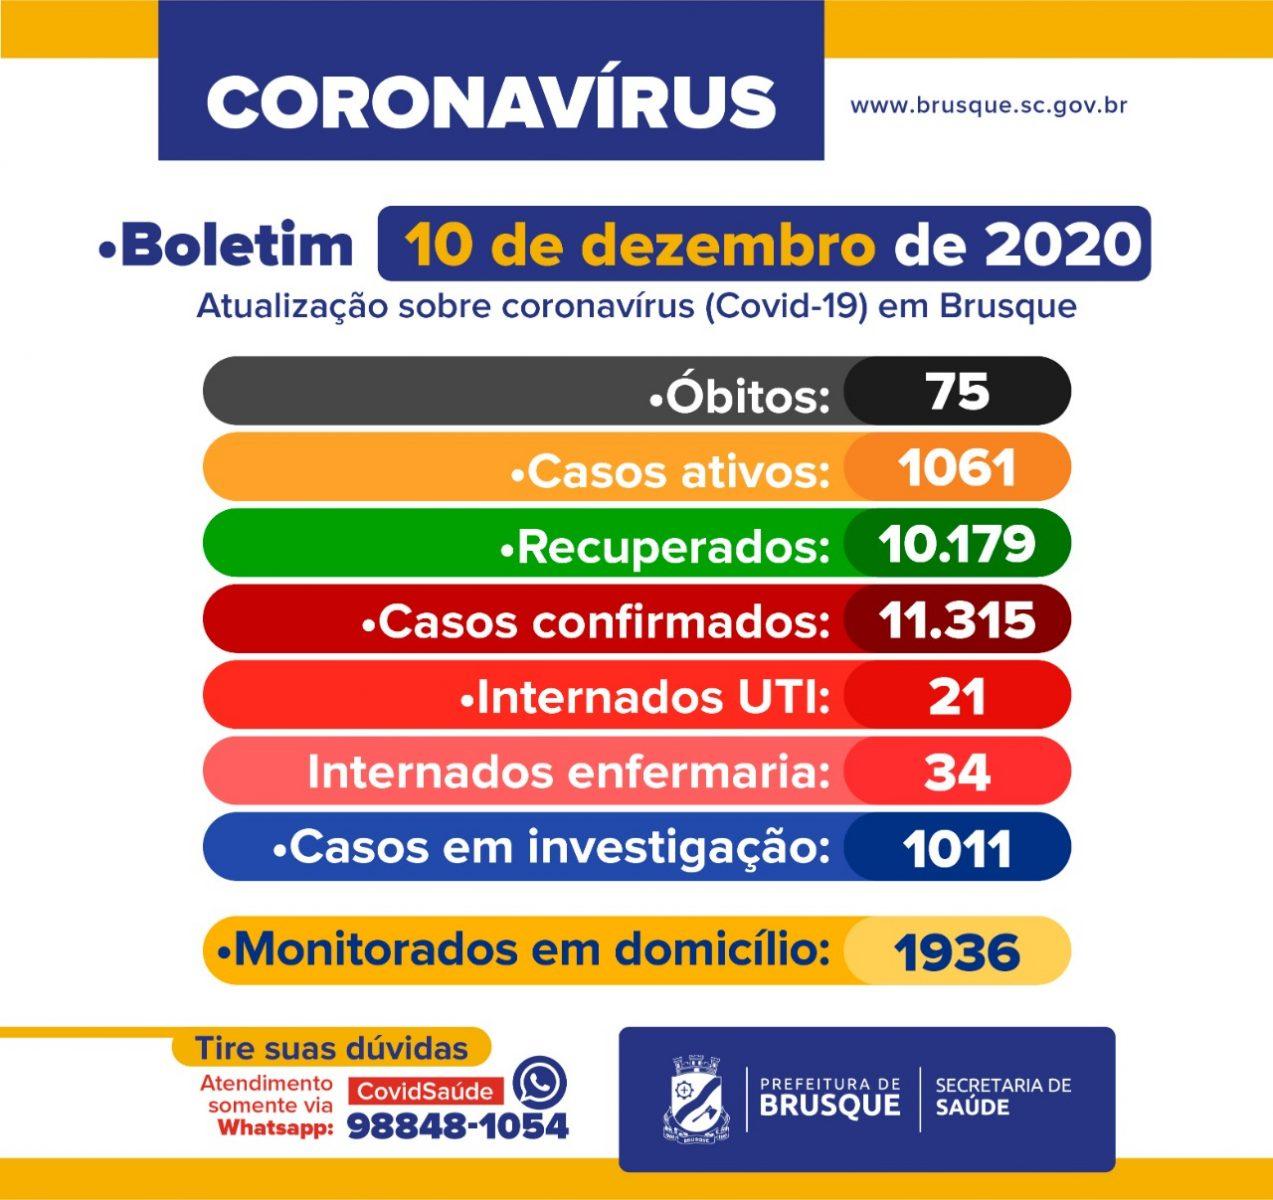 Covid-19: Boletim epidemiológico de 10 de dezembro